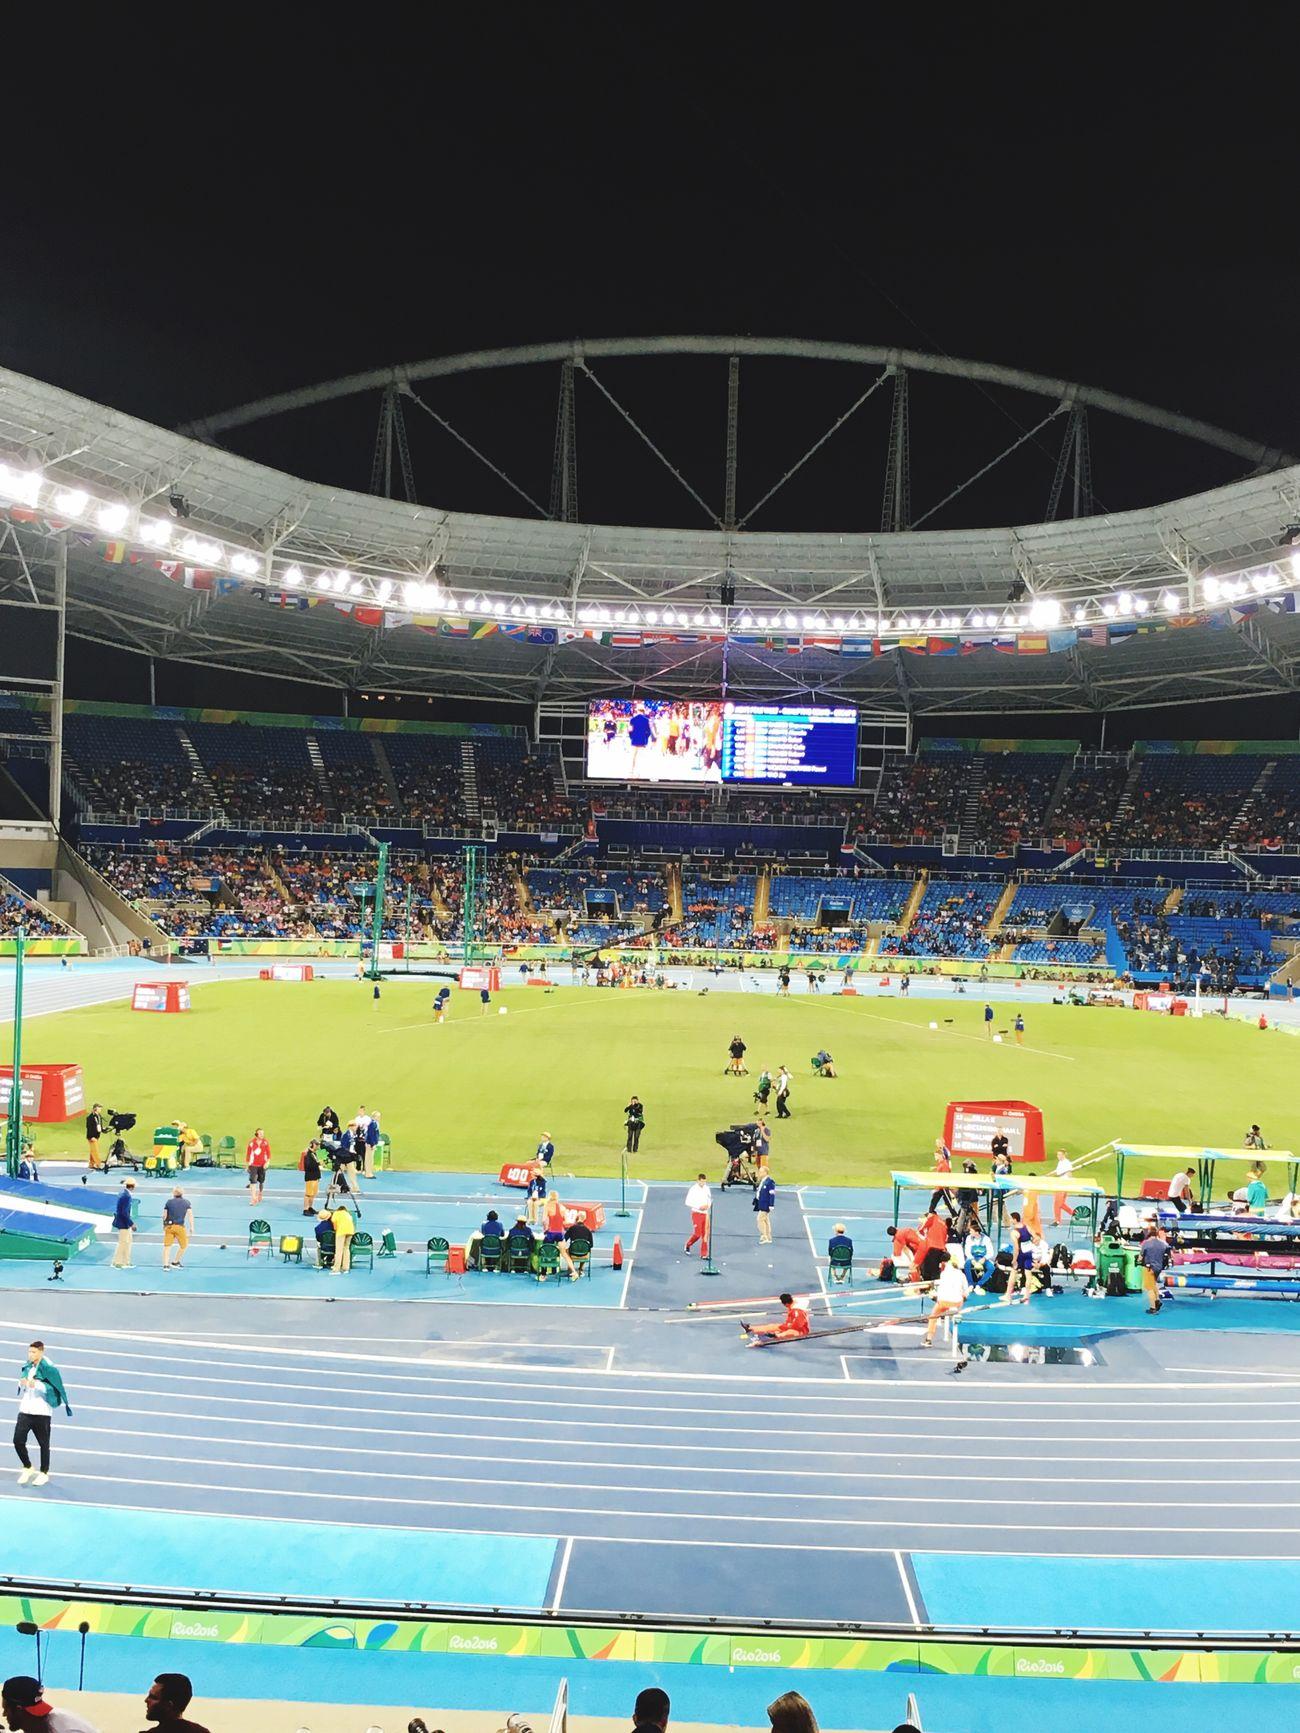 Estádio Olímpico Nilton Santos-Engenhão -Atletismo